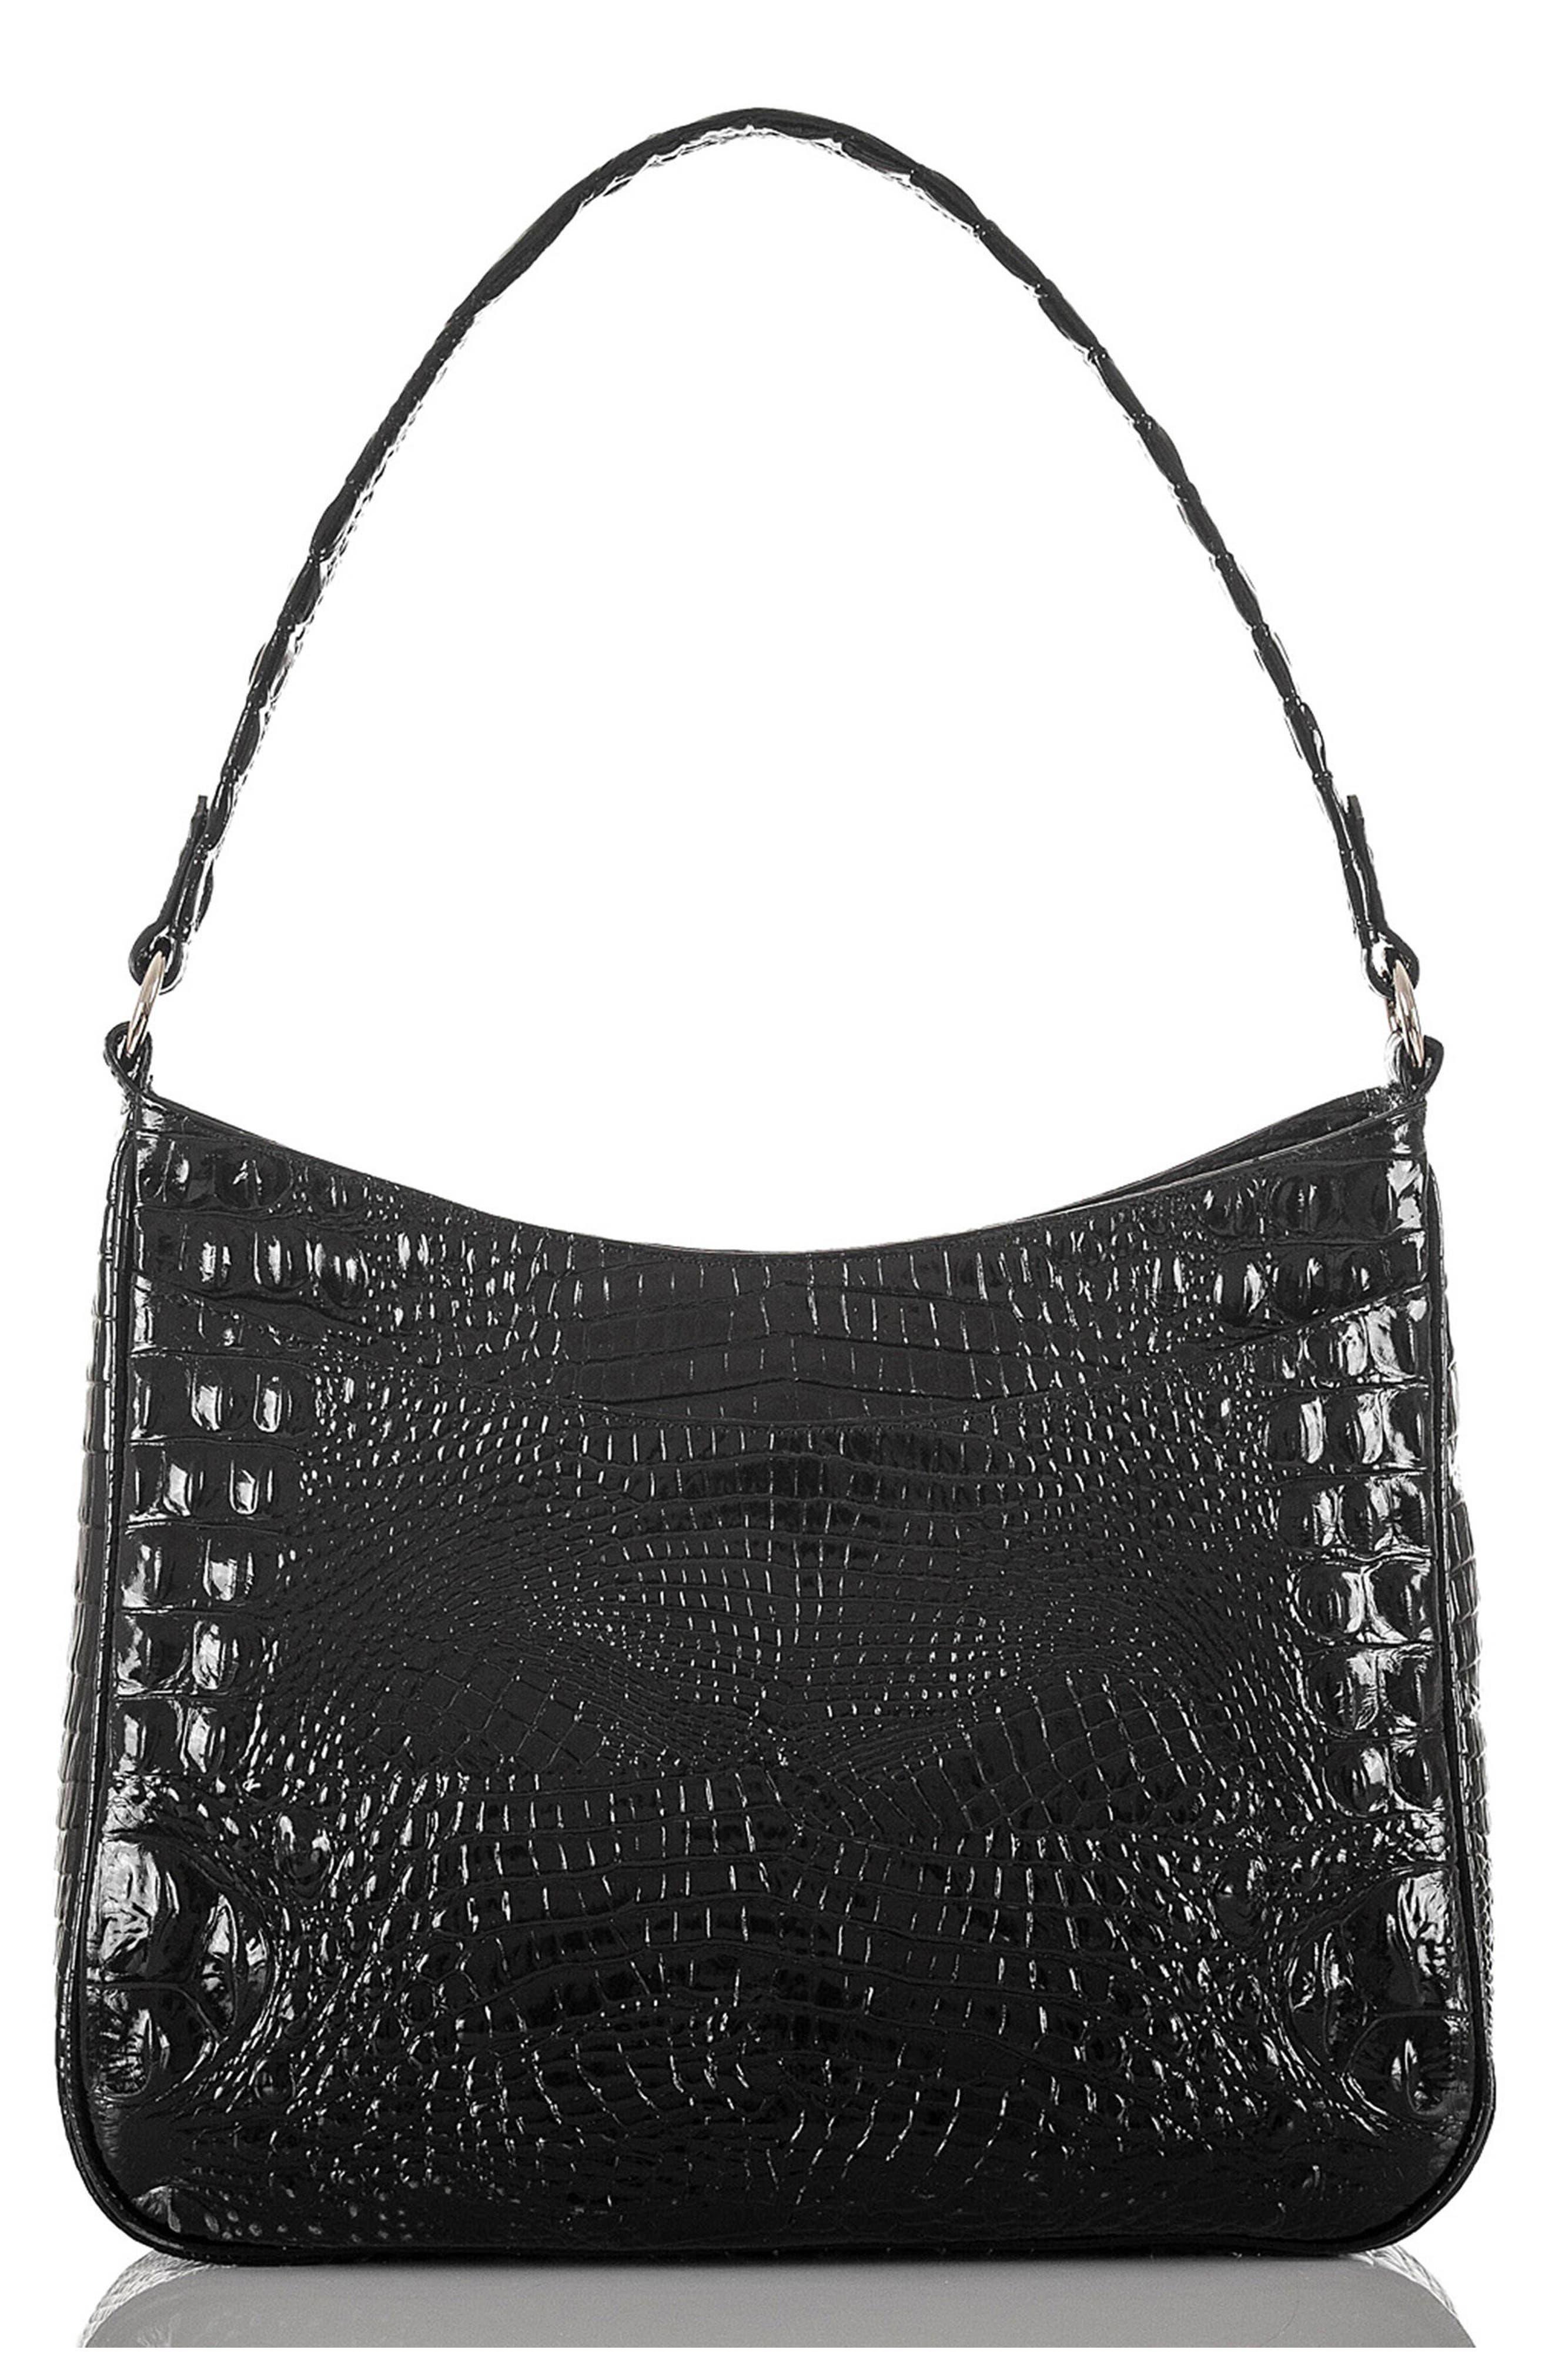 Noelle Croc Embossed Leather Hobo Bag,                             Alternate thumbnail 3, color,                             BLACK